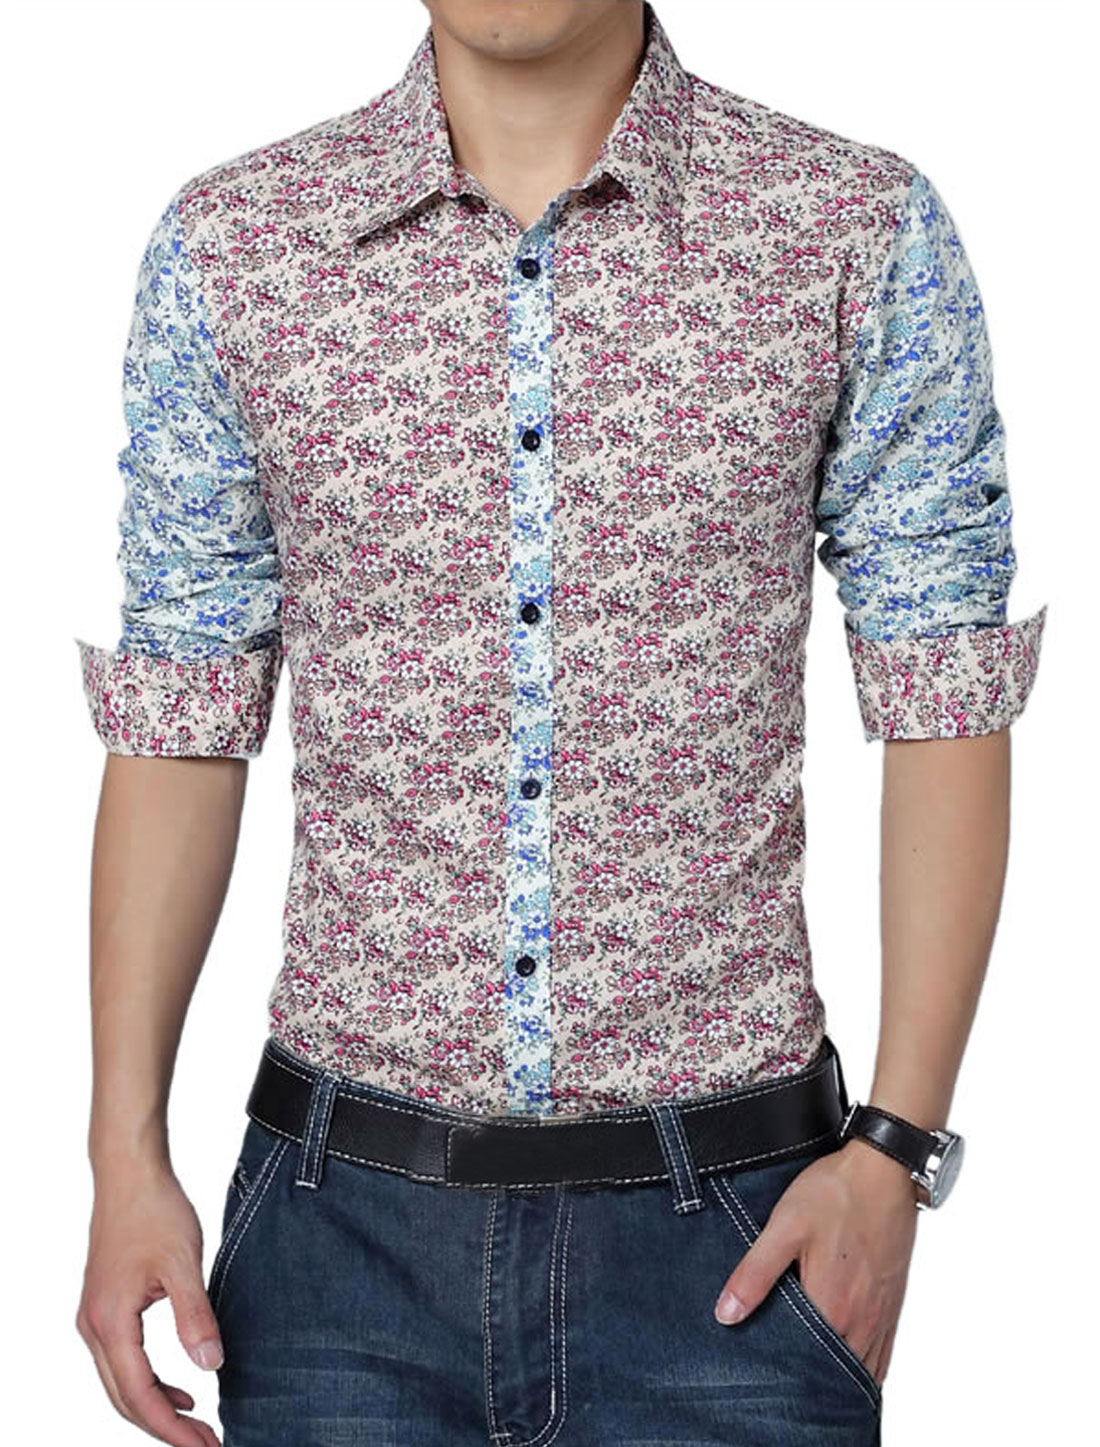 Men Long Sleeve Floral Prints Panel Design Colorblock Shirt Fuchsia L